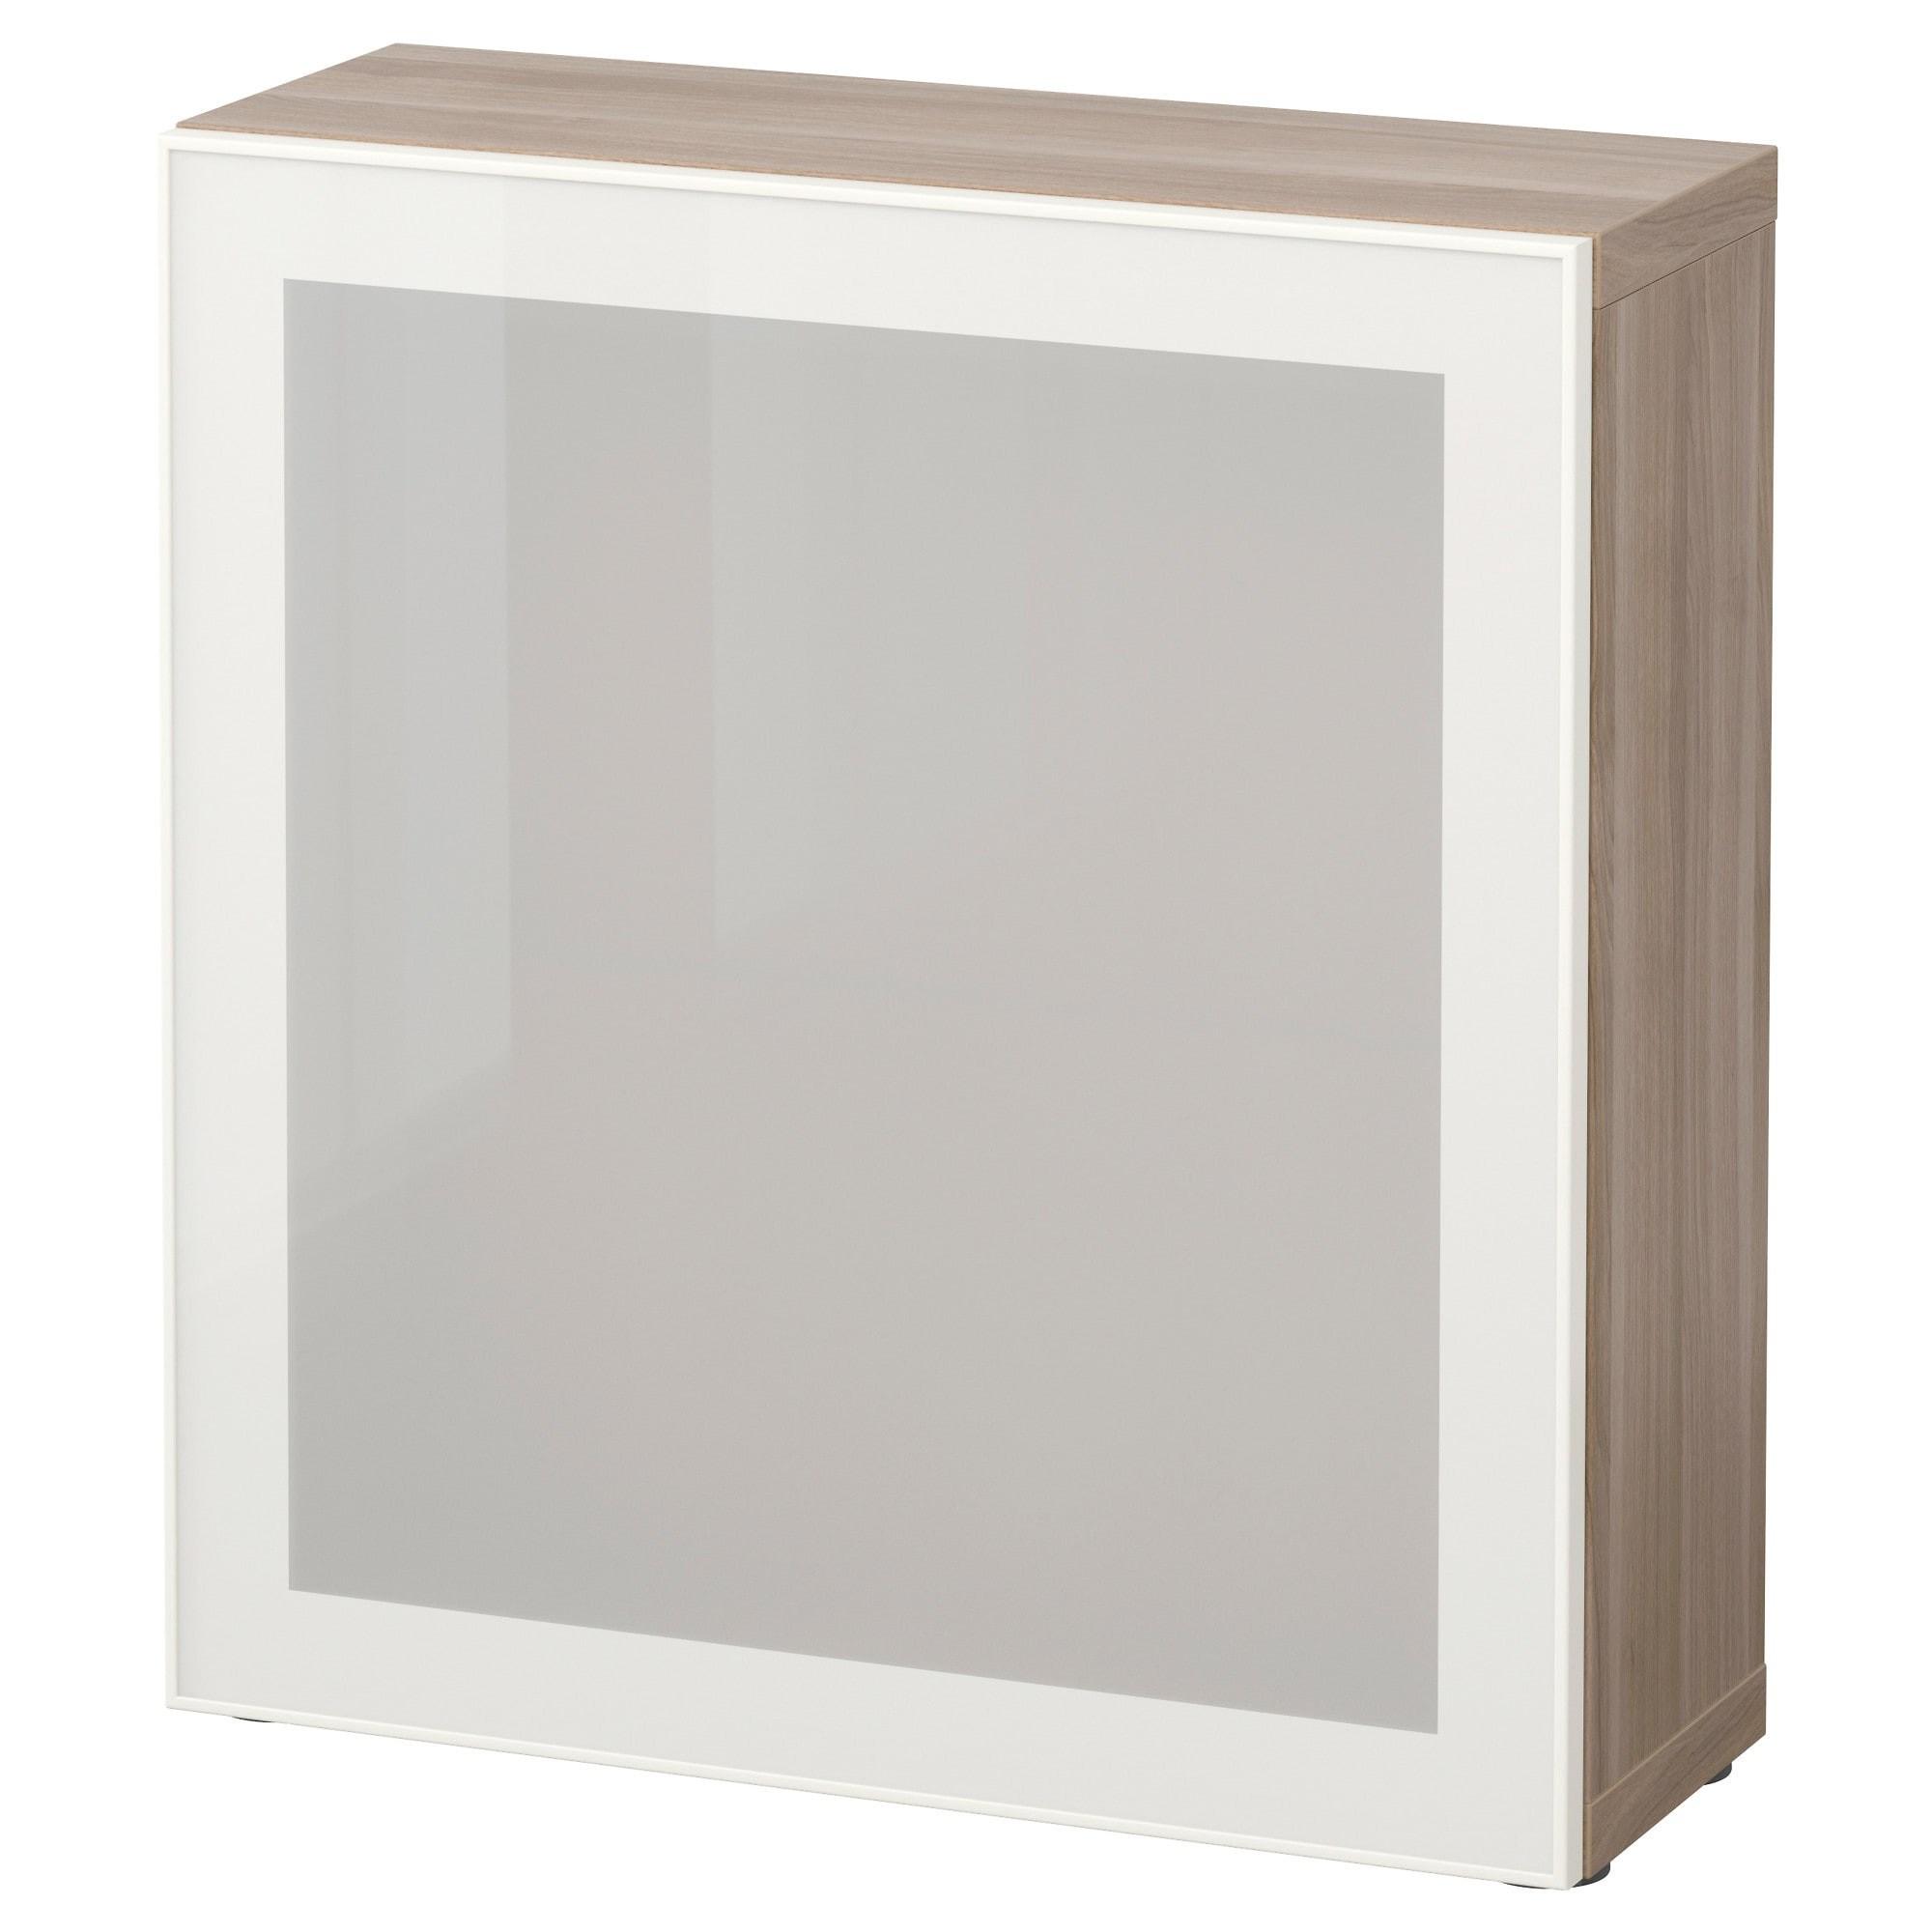 Ikea meuble haut profondeur 20 cm veranda - Meuble profondeur 20 cm ...